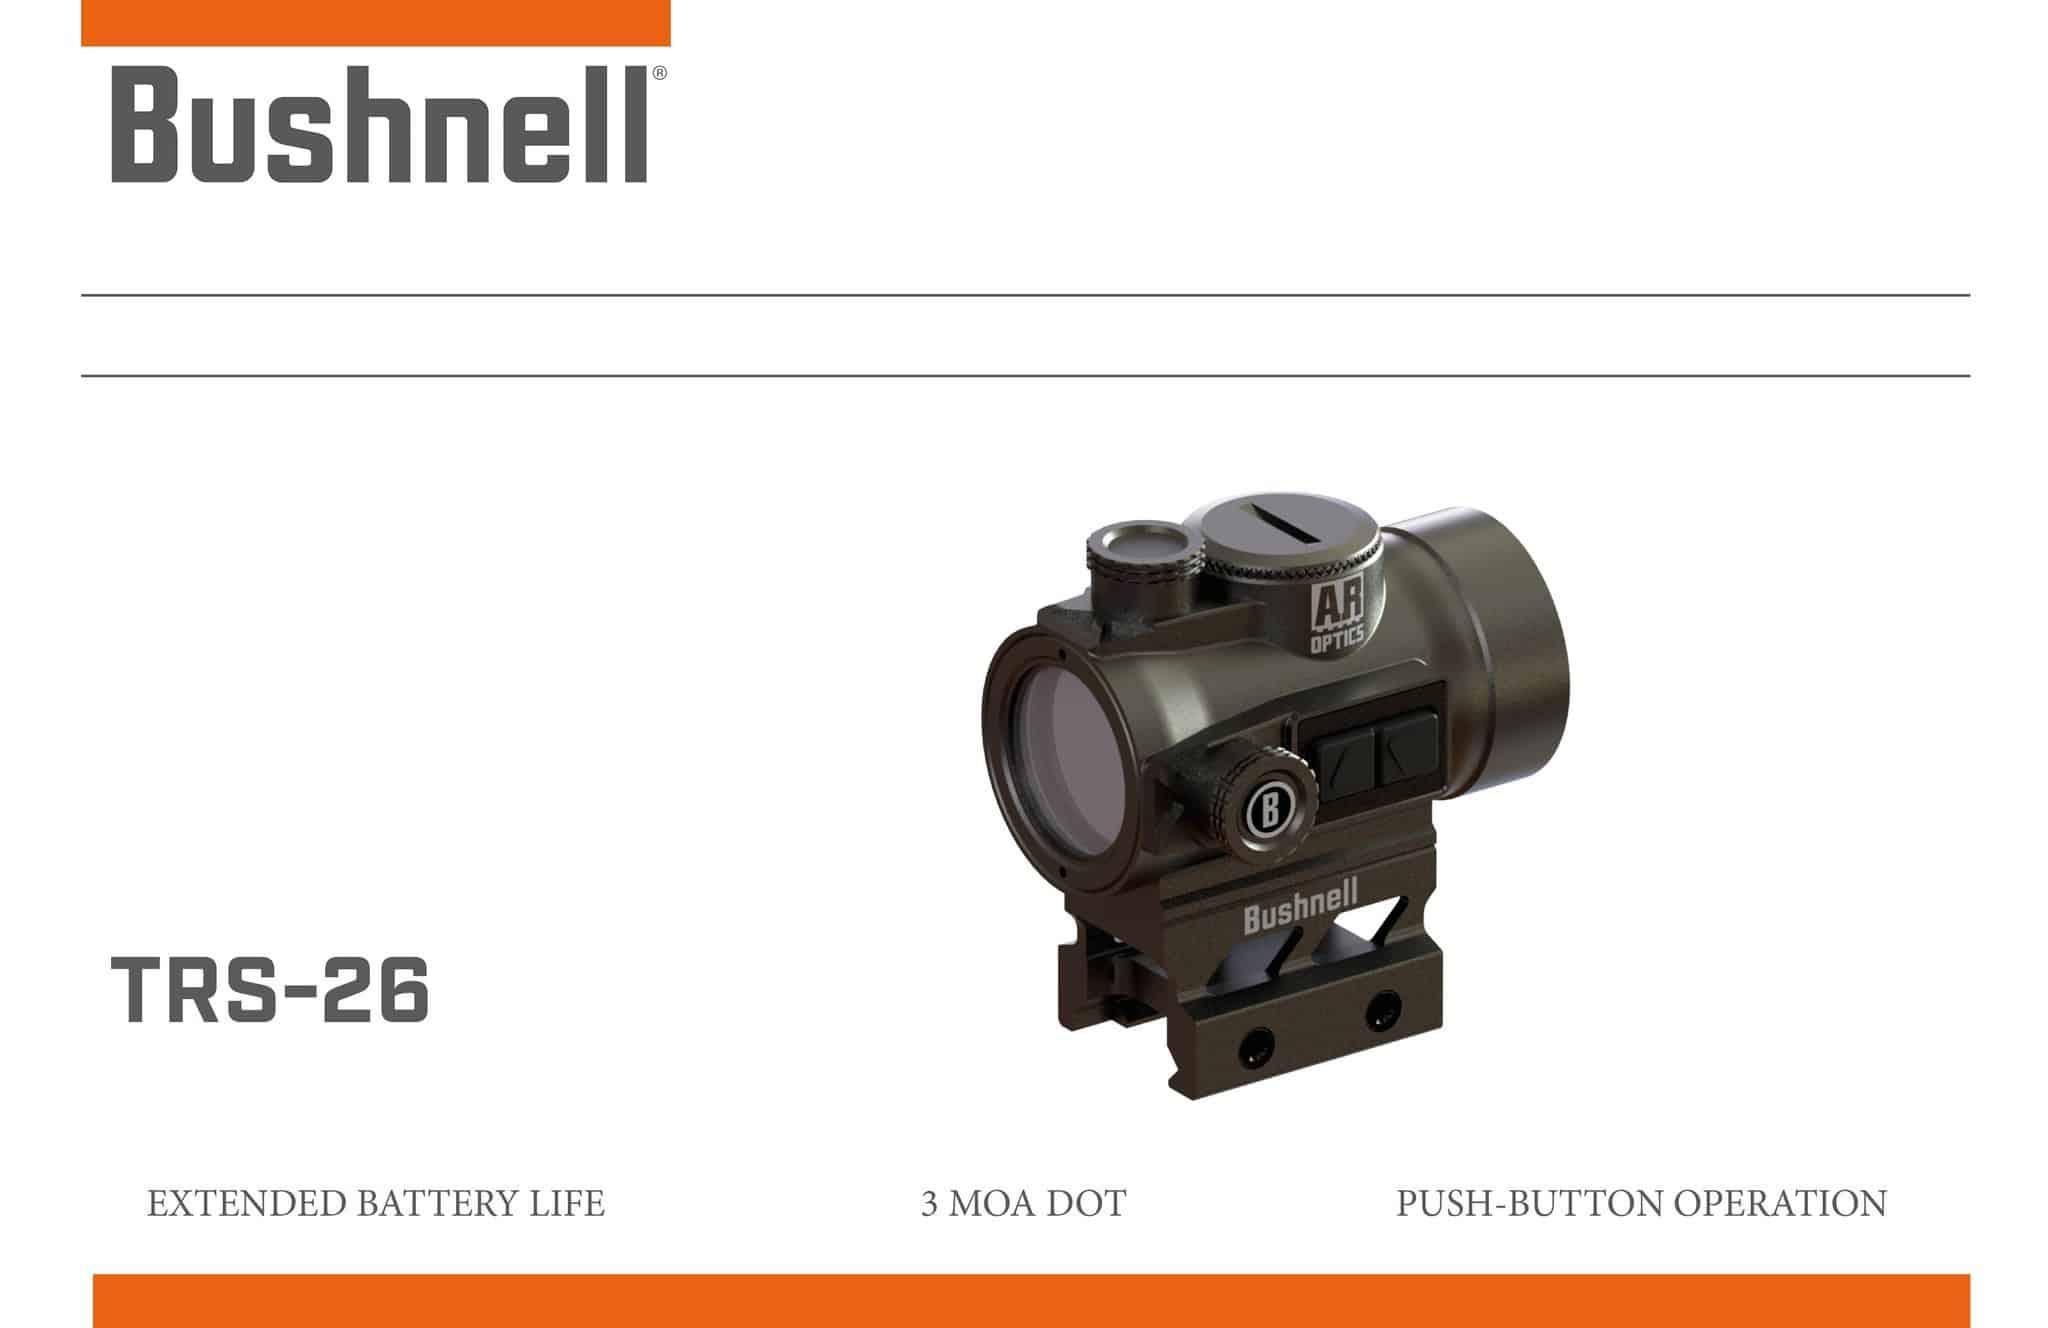 Bushnell TRS-26 Red Dot Sight